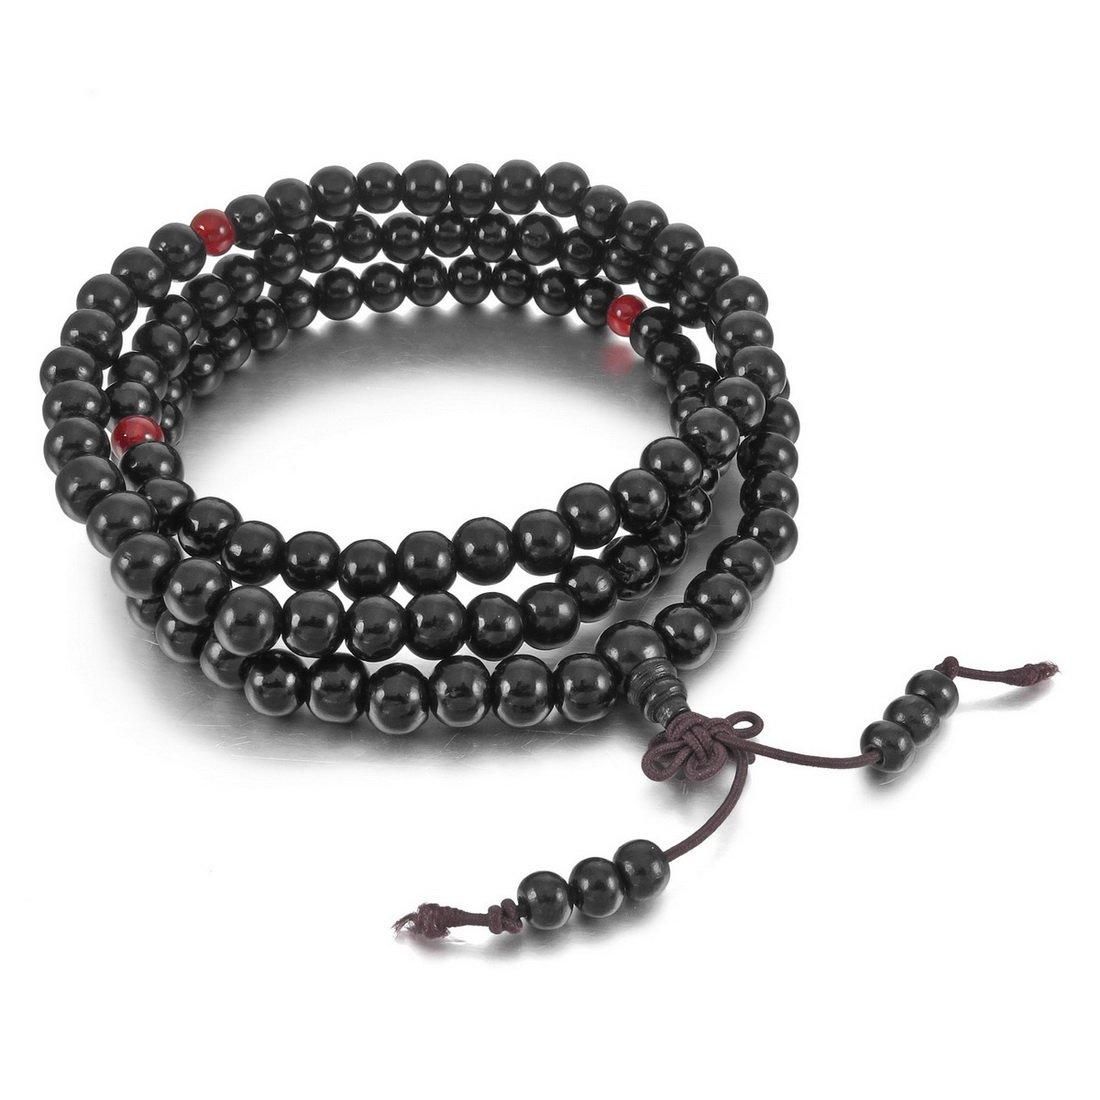 INBLUE Men,Women's 8mm Wood Bracelet Link Wrist Necklace Chain Tibetan Buddhist Black Sandalwood Bead Prayer Buddha Mala Chinese knot Elastic